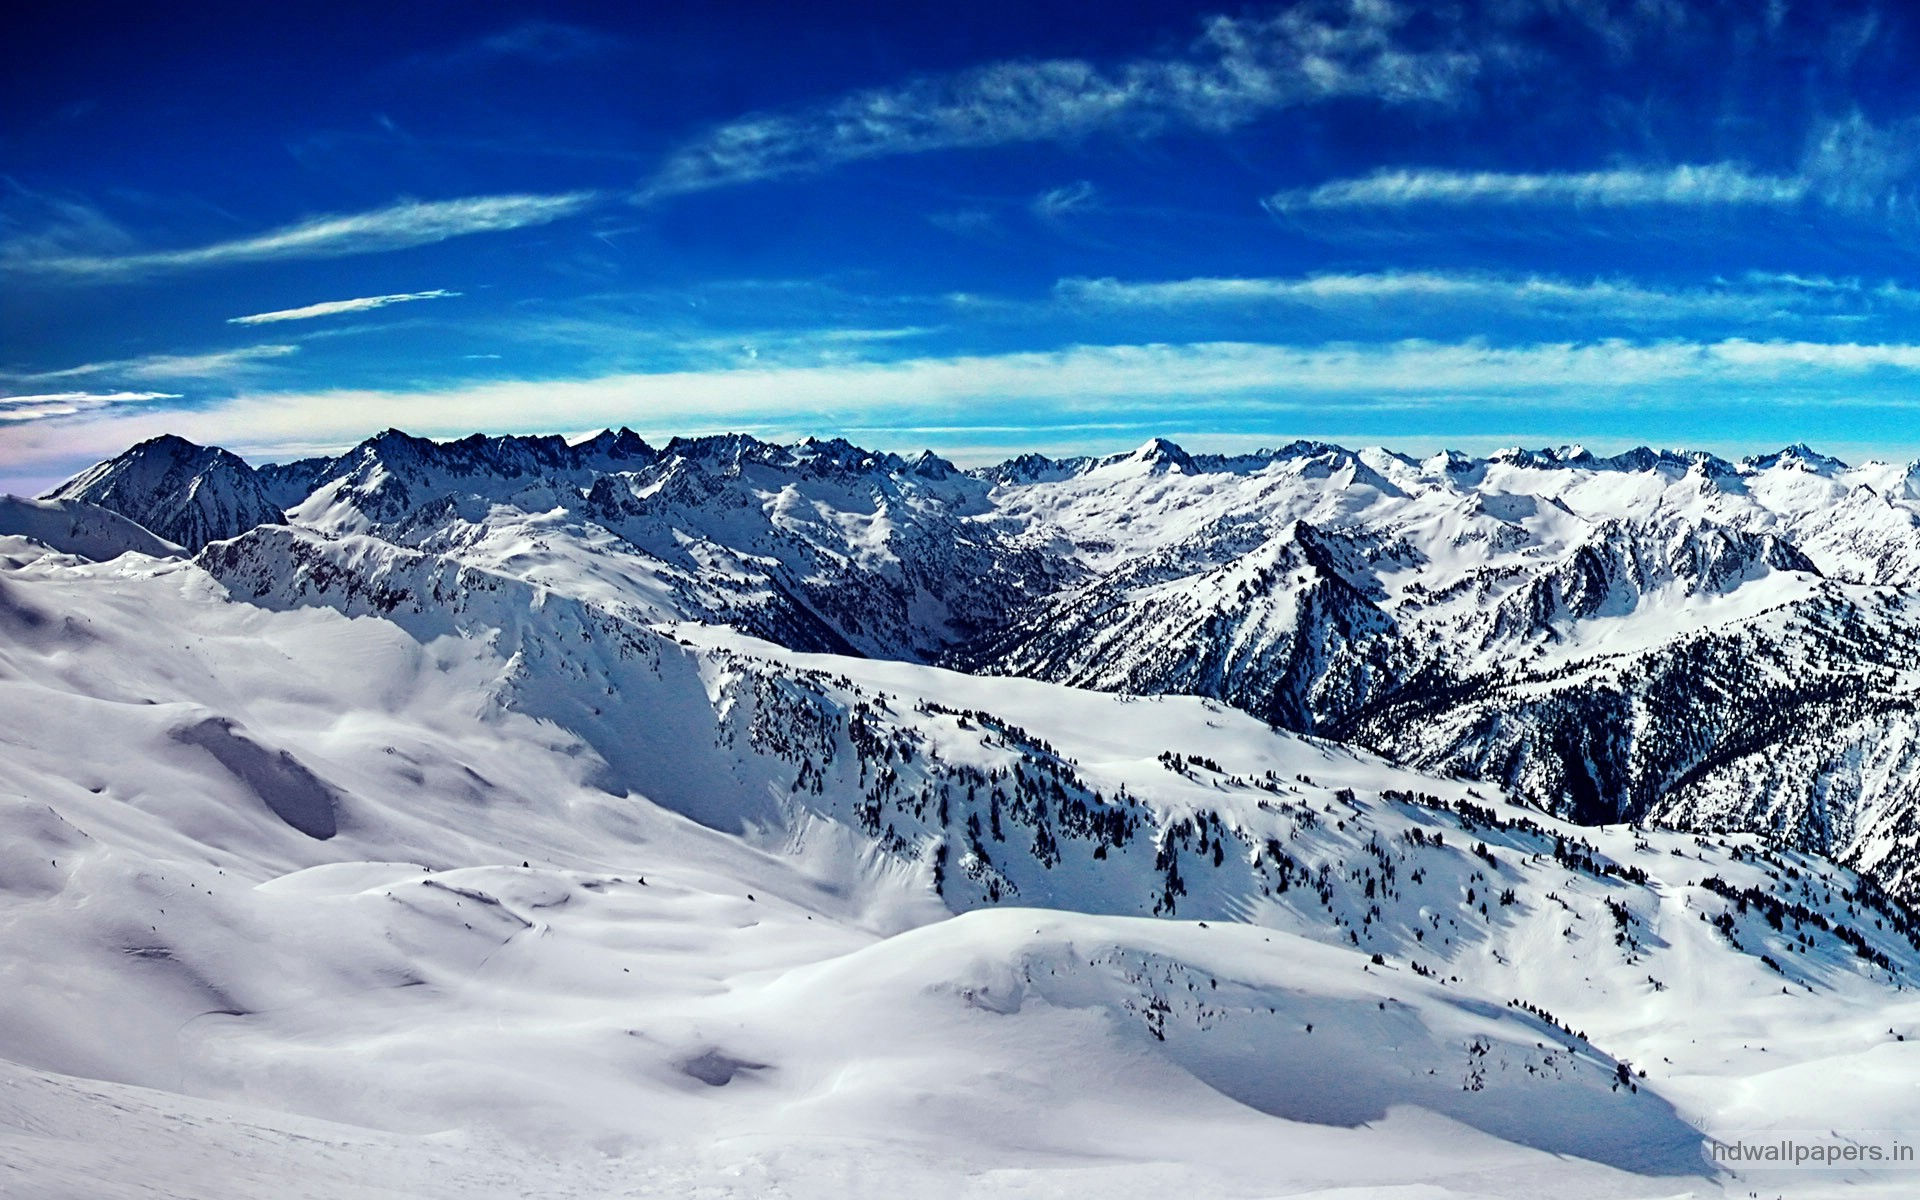 Amazing Wallpaper Mountain 1080p - mountain-1080p-wallpaper-115  Collection_526039.jpg